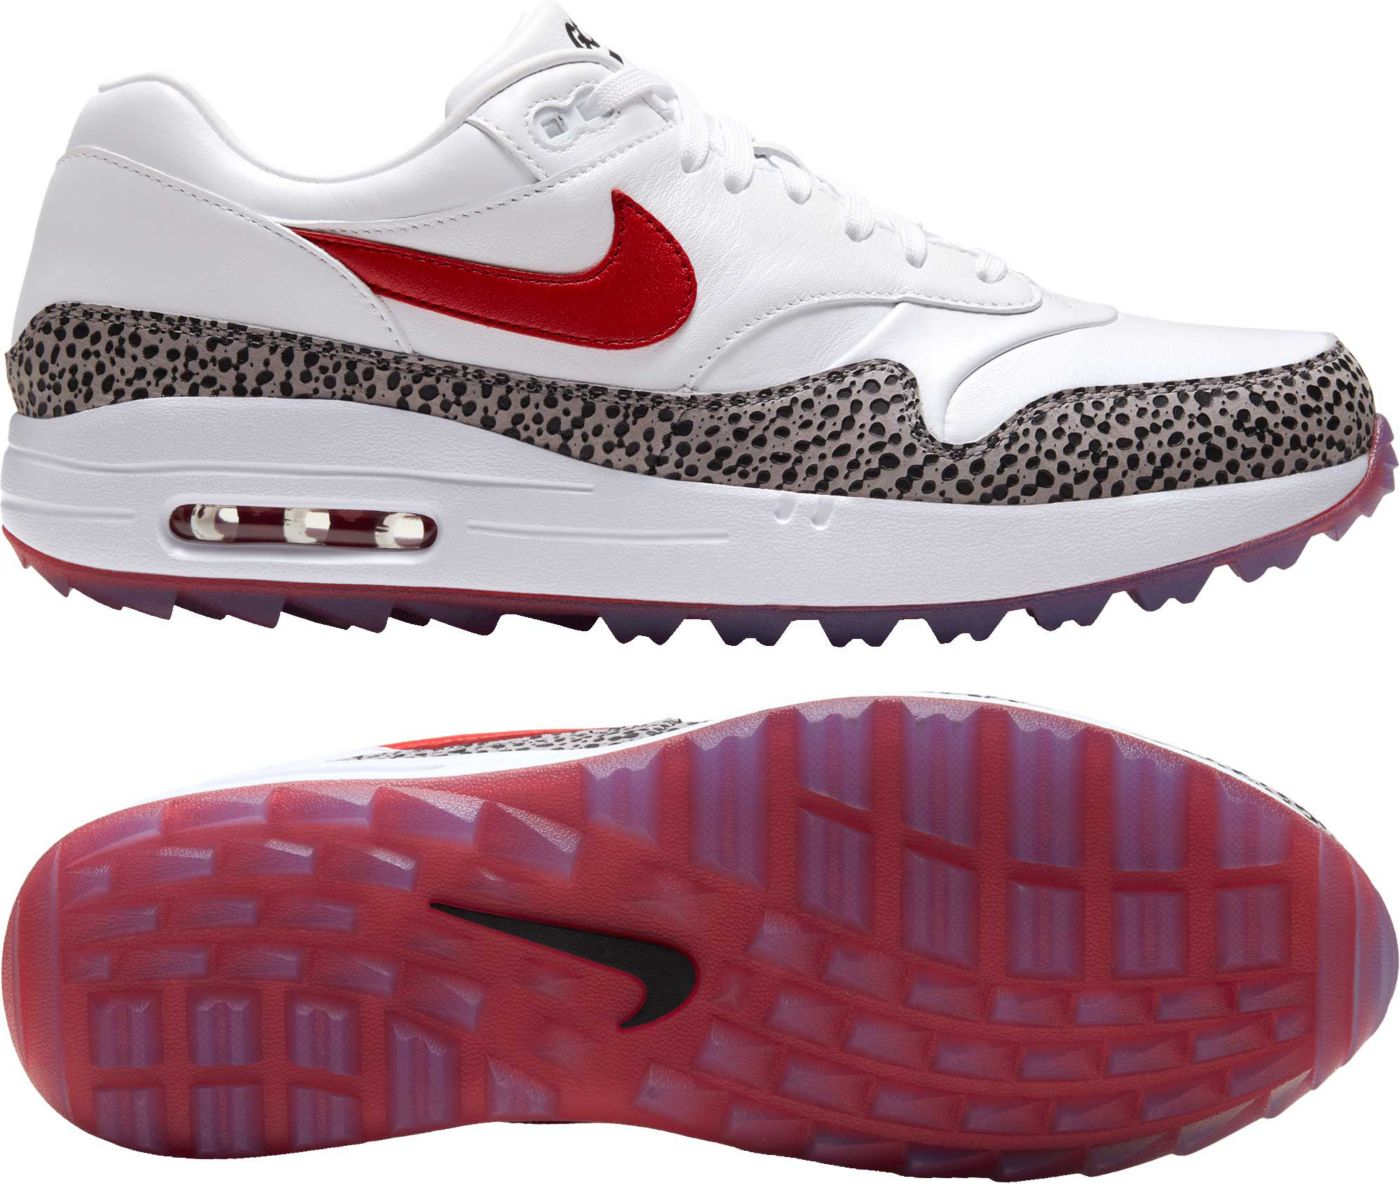 Nike Men's Air Max 1 G NRG Golf Shoes